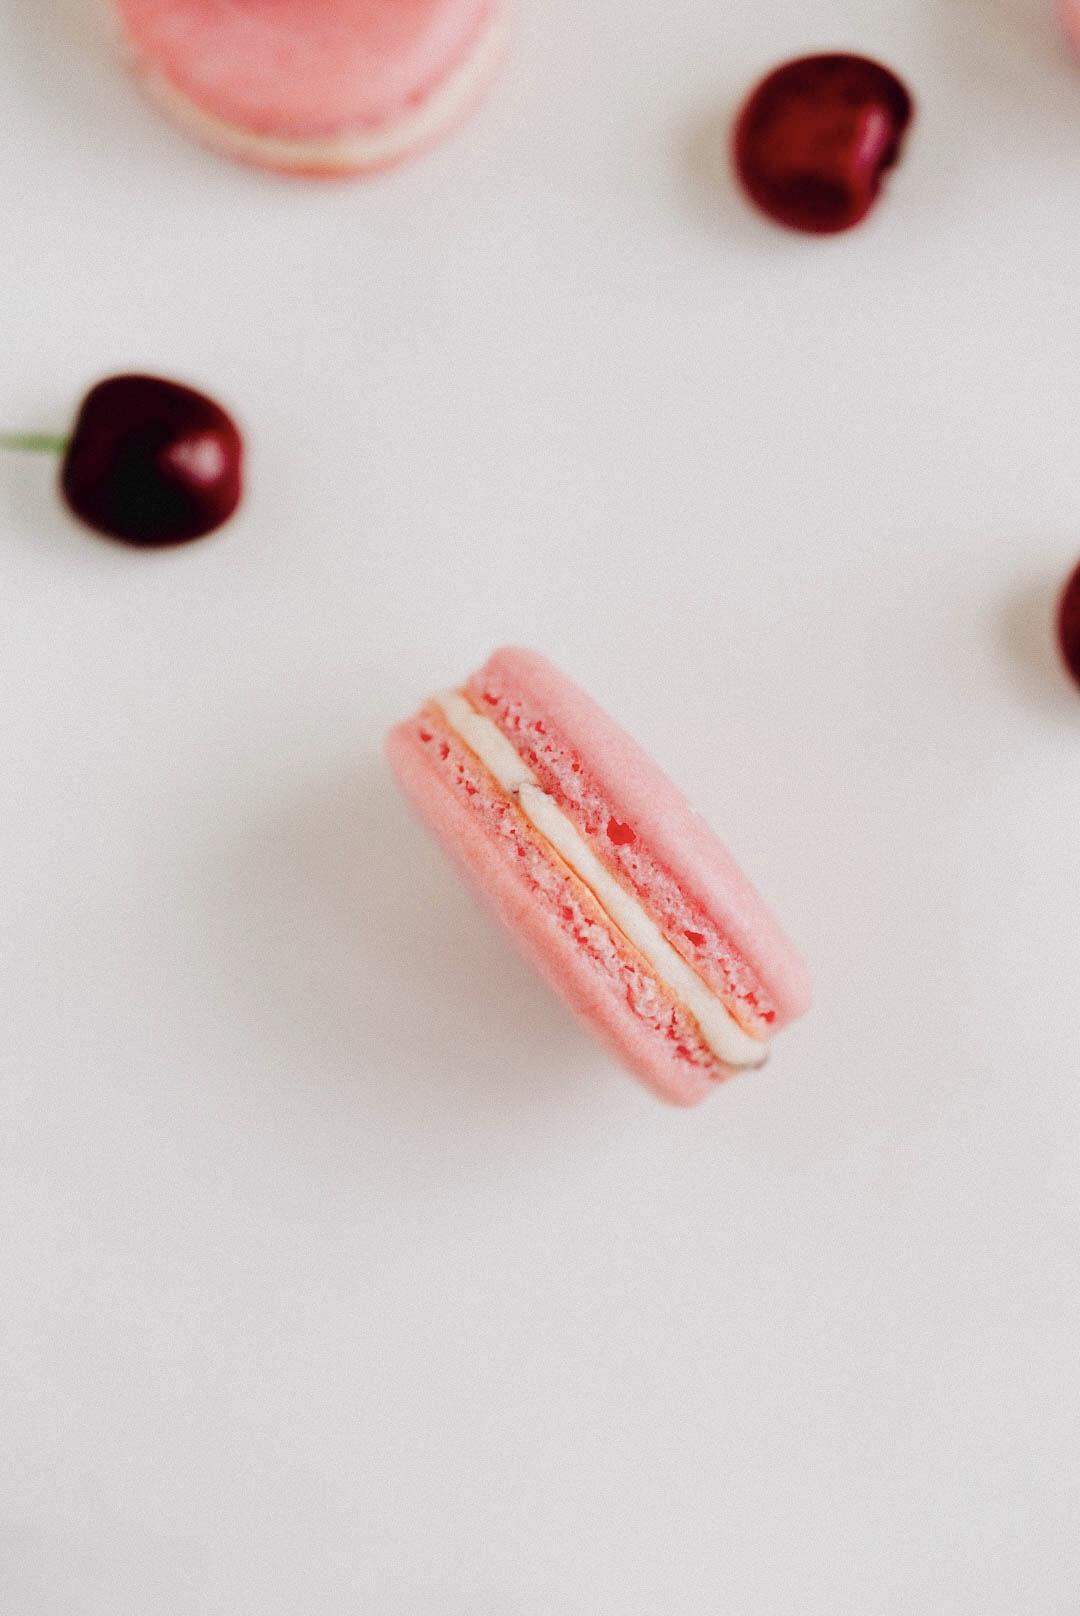 cherry vanilla macarons on white marble counter